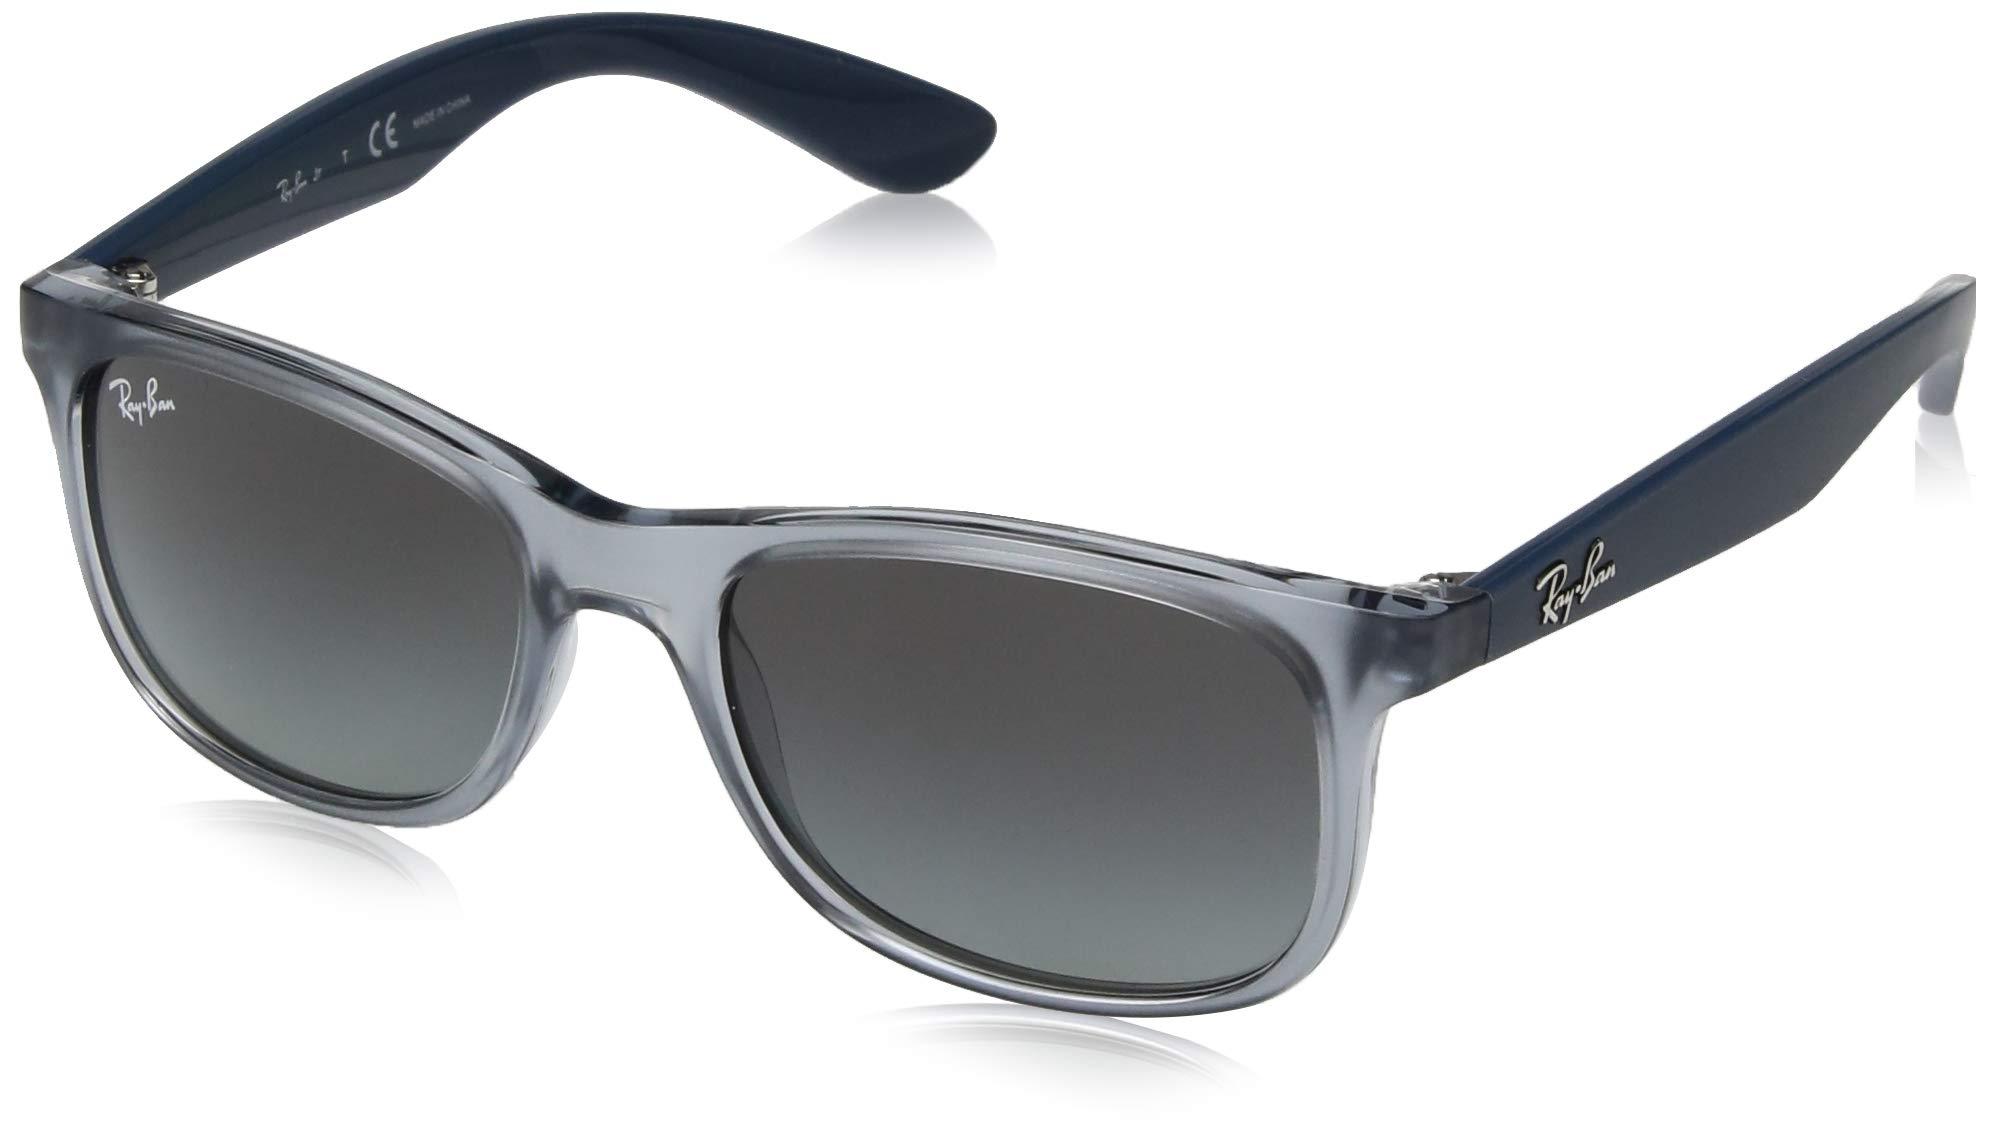 RAY-BAN JUNIOR Kids' RJ9062S Rectangular Kids Sunglasses, Transparent Blue/Grey Gradient, 48 mm by RAY-BAN JUNIOR